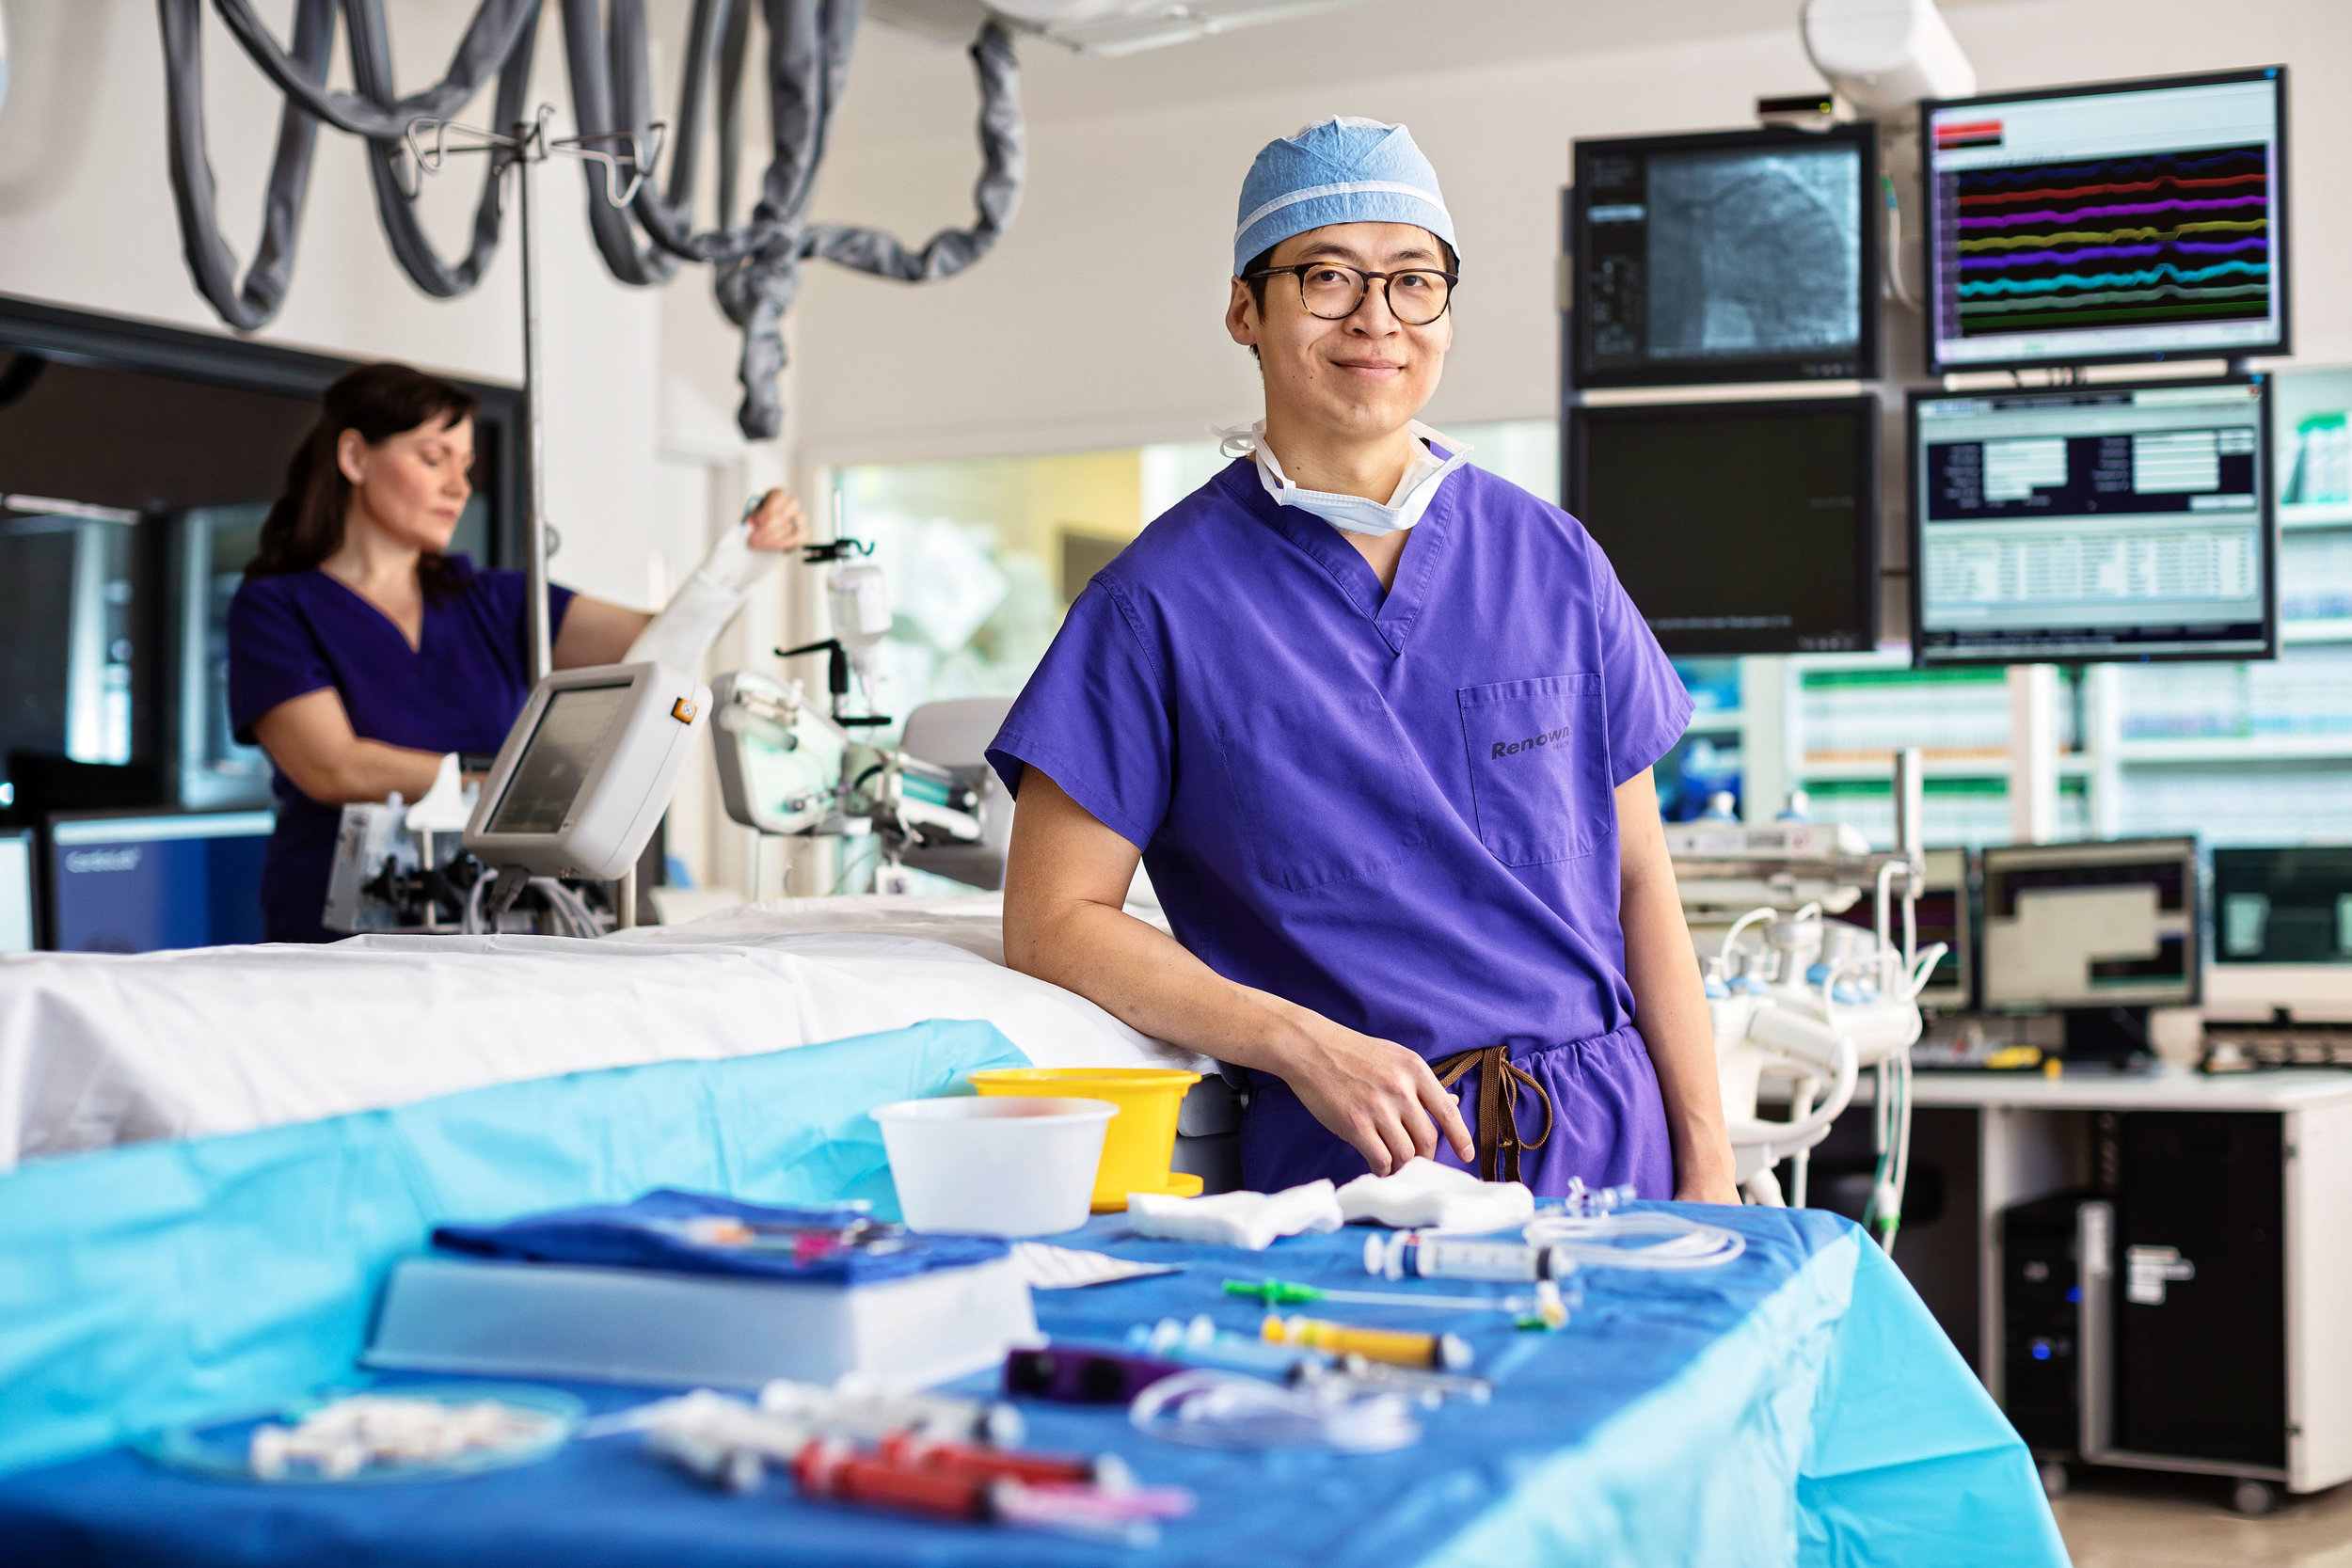 3089RH_Heart1_DrSun_Nurse(Hero)4297.JPG